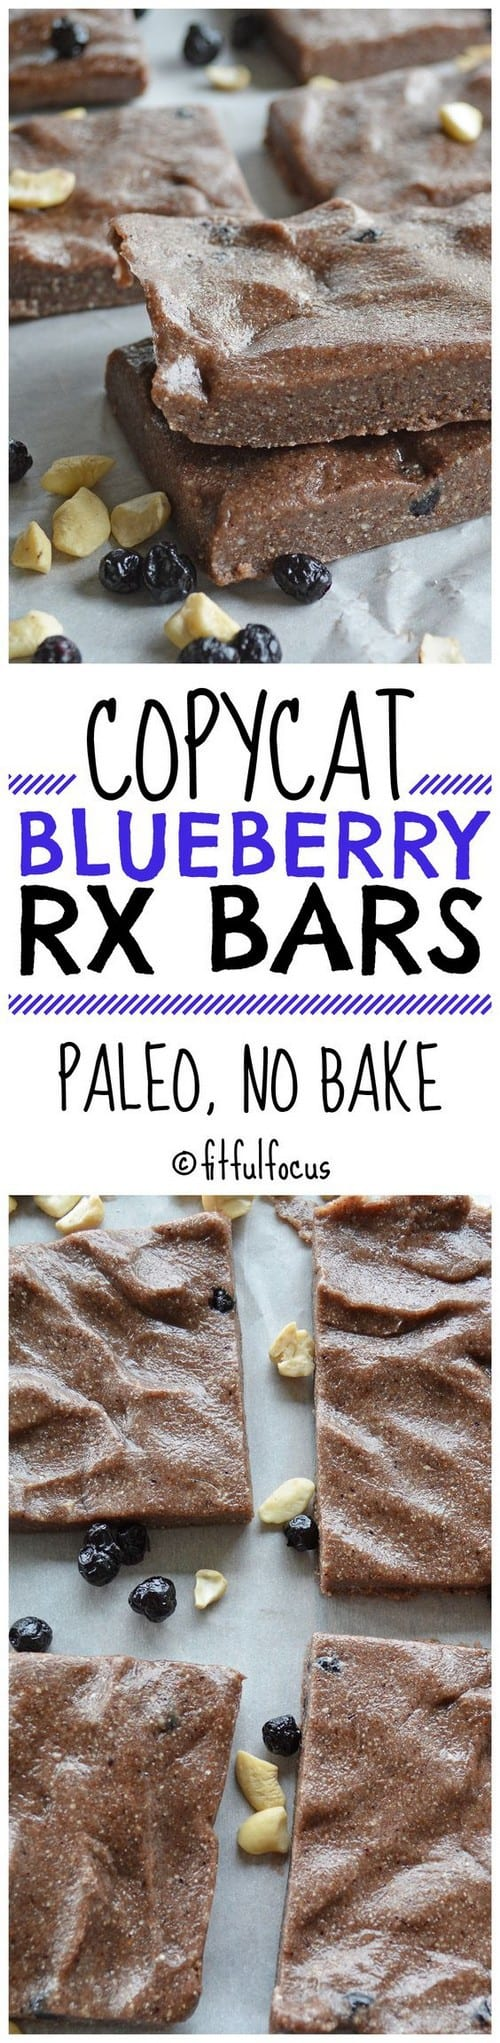 Whole30 Copycat Blueberry RX Bars